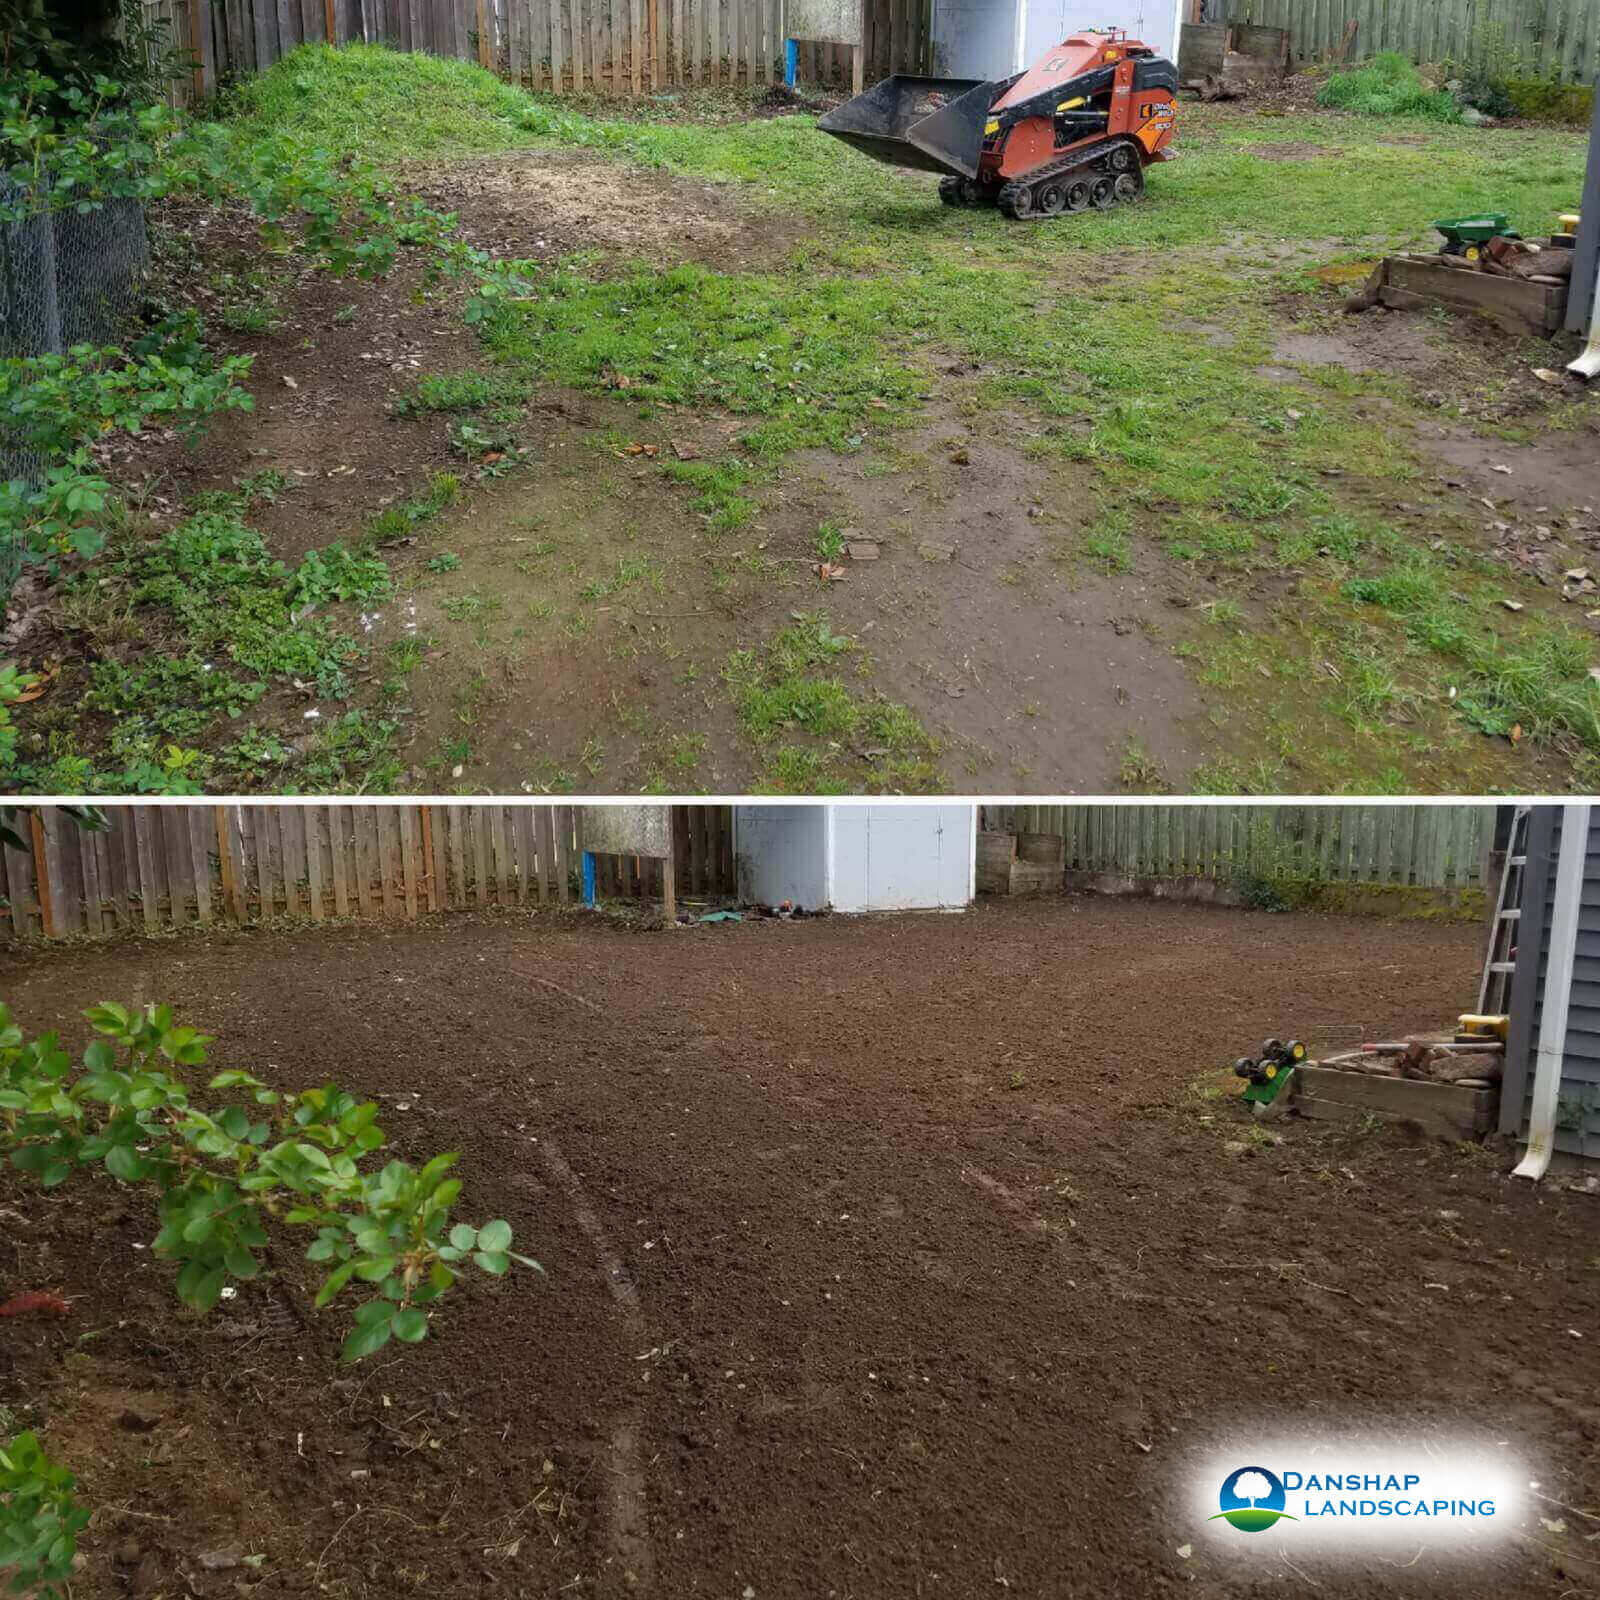 Excavation-Danshaplandscape-6